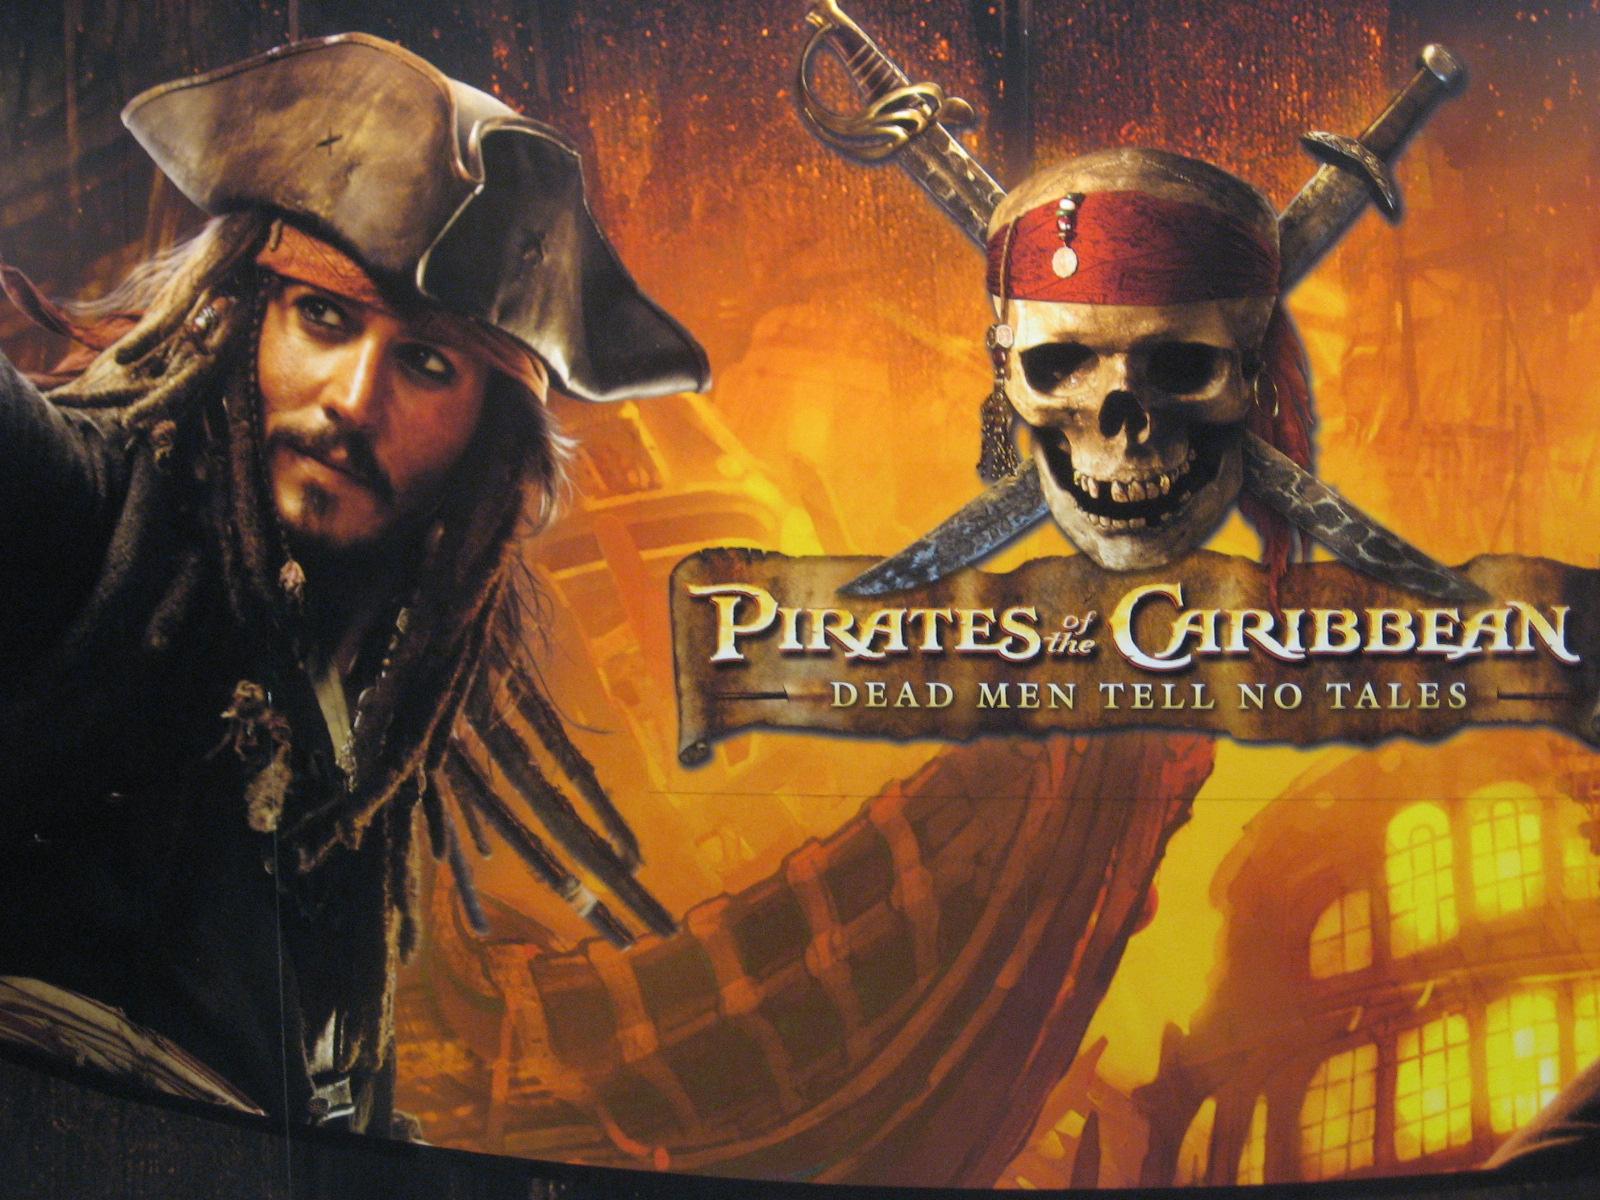 http://3.bp.blogspot.com/-cN6lcUfaq-I/Tdo_Mg-kjeI/AAAAAAAAACY/r5FB3E7IwGw/s1600/Pirates%2Bof%2Bthe%2BCaribbean%2B-%2BOn%2BStranger%2BTides%2B2011.jpg